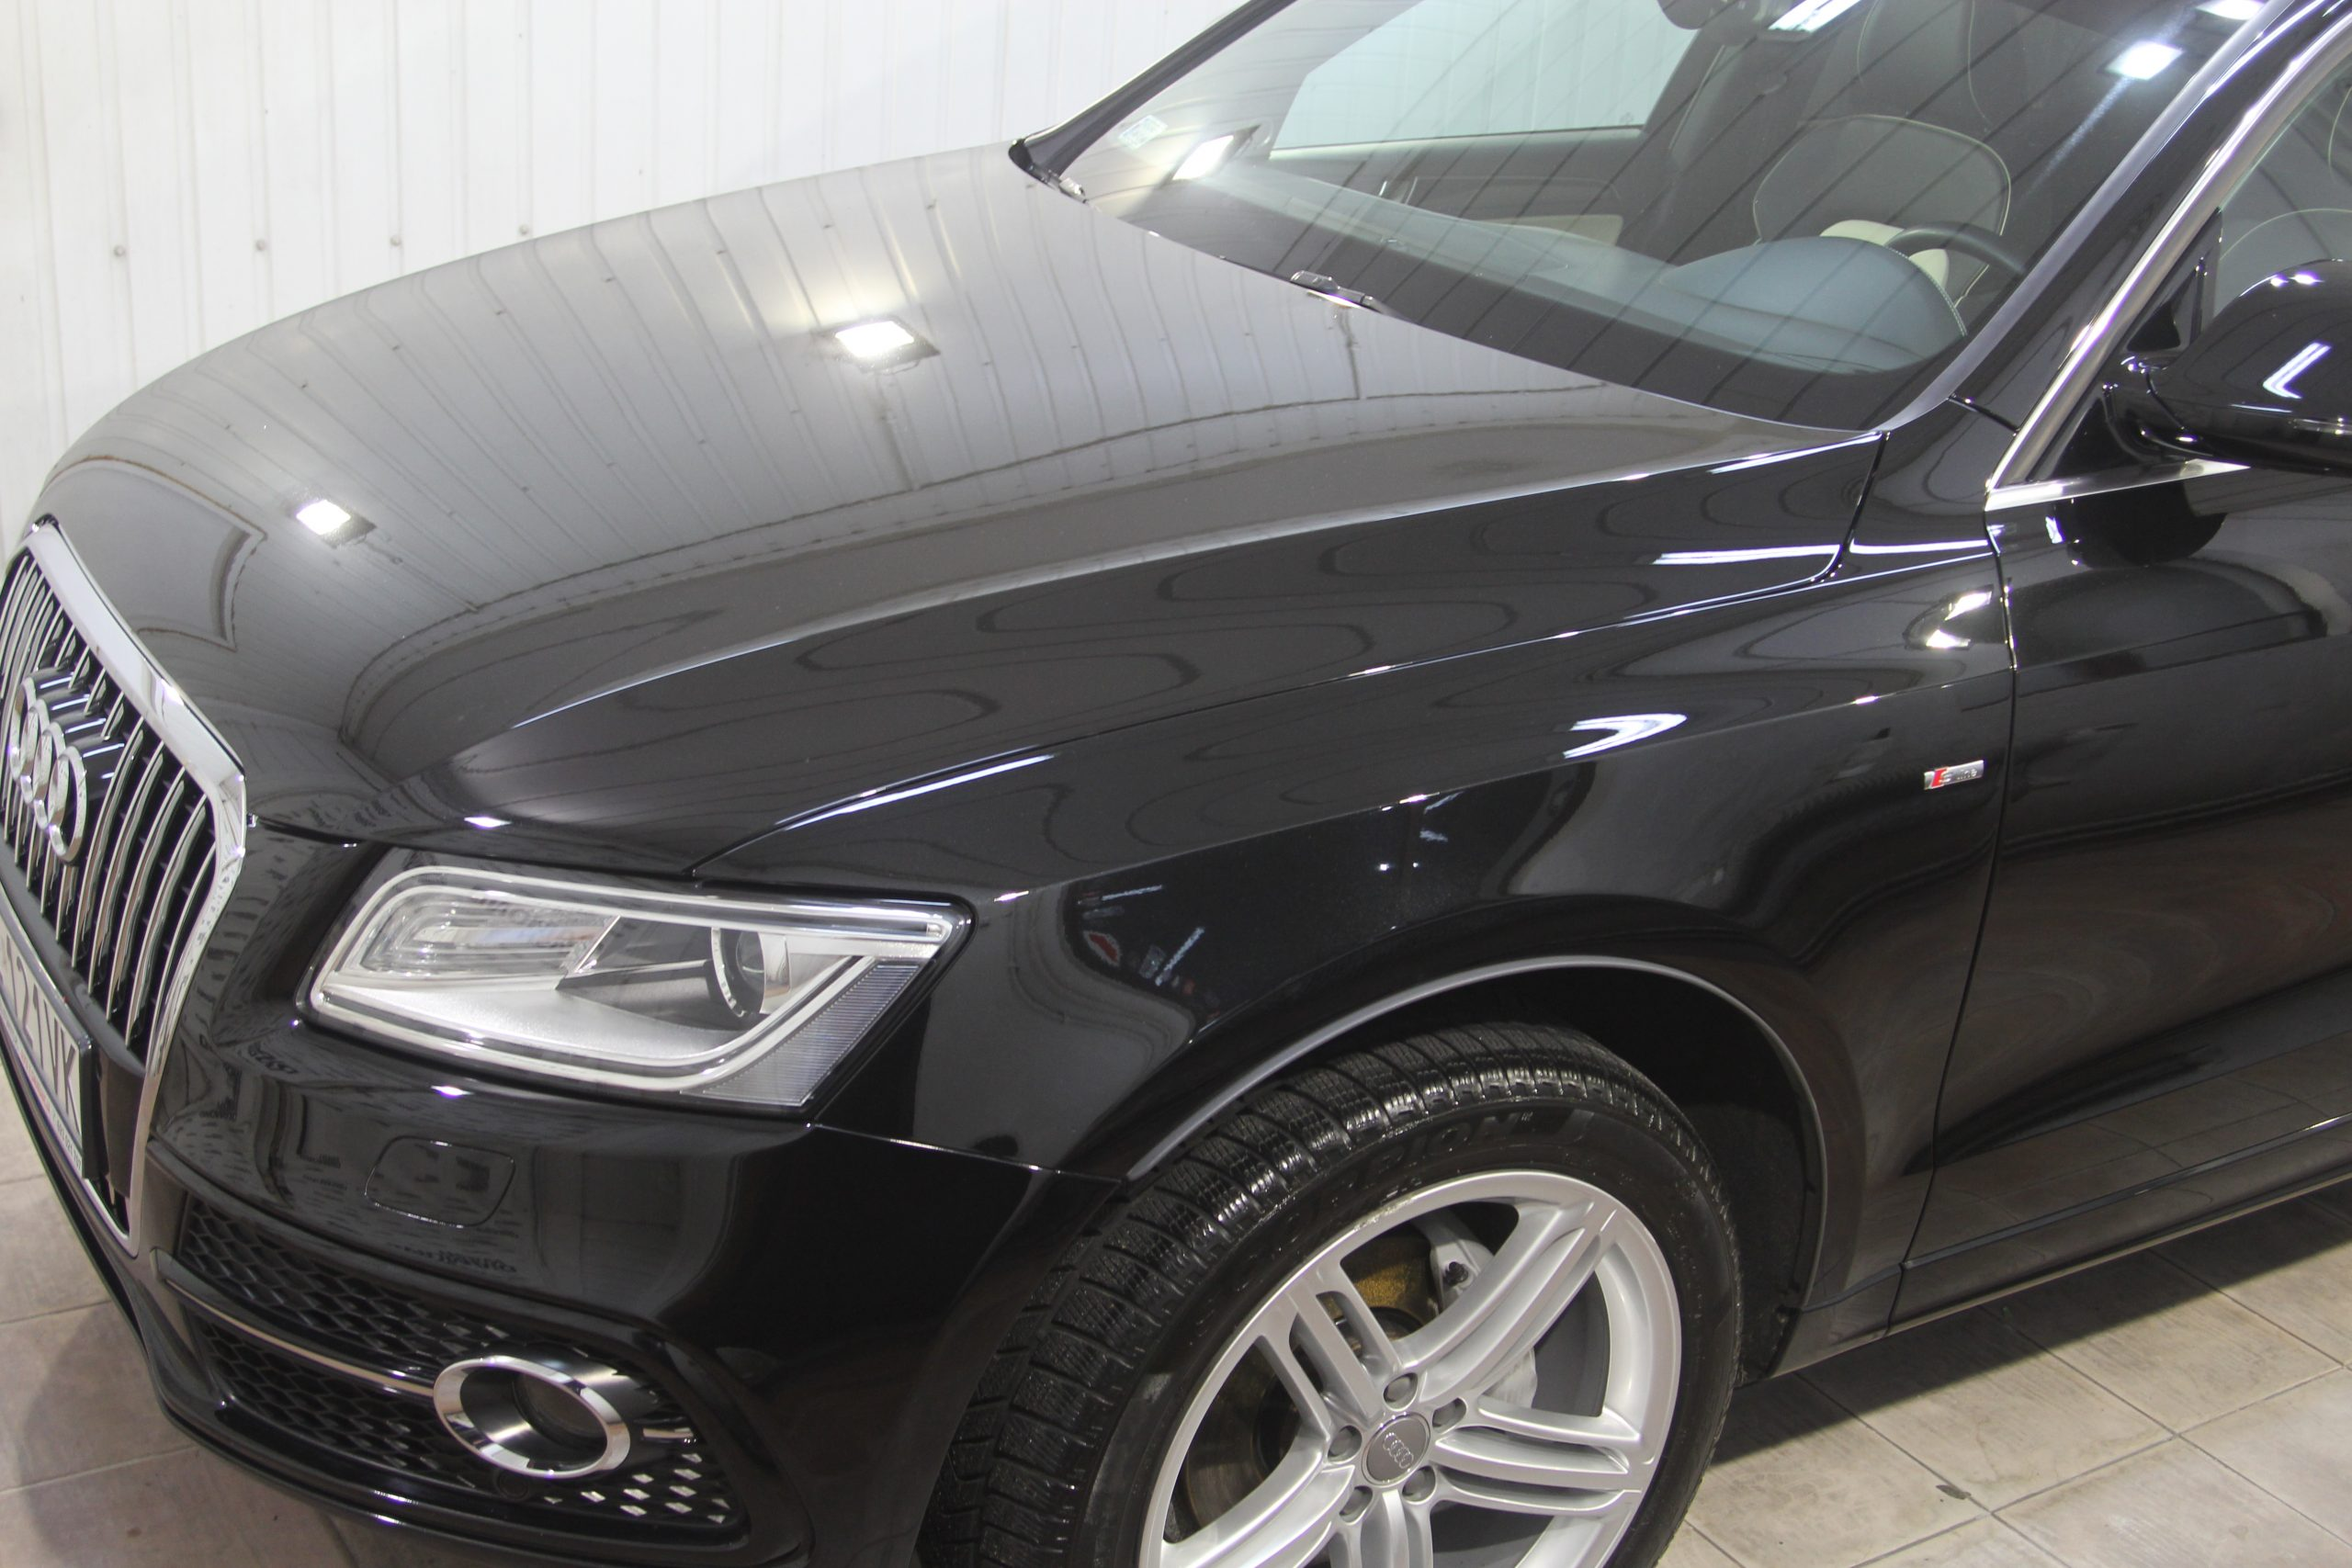 Audi Q5 znowu nowe